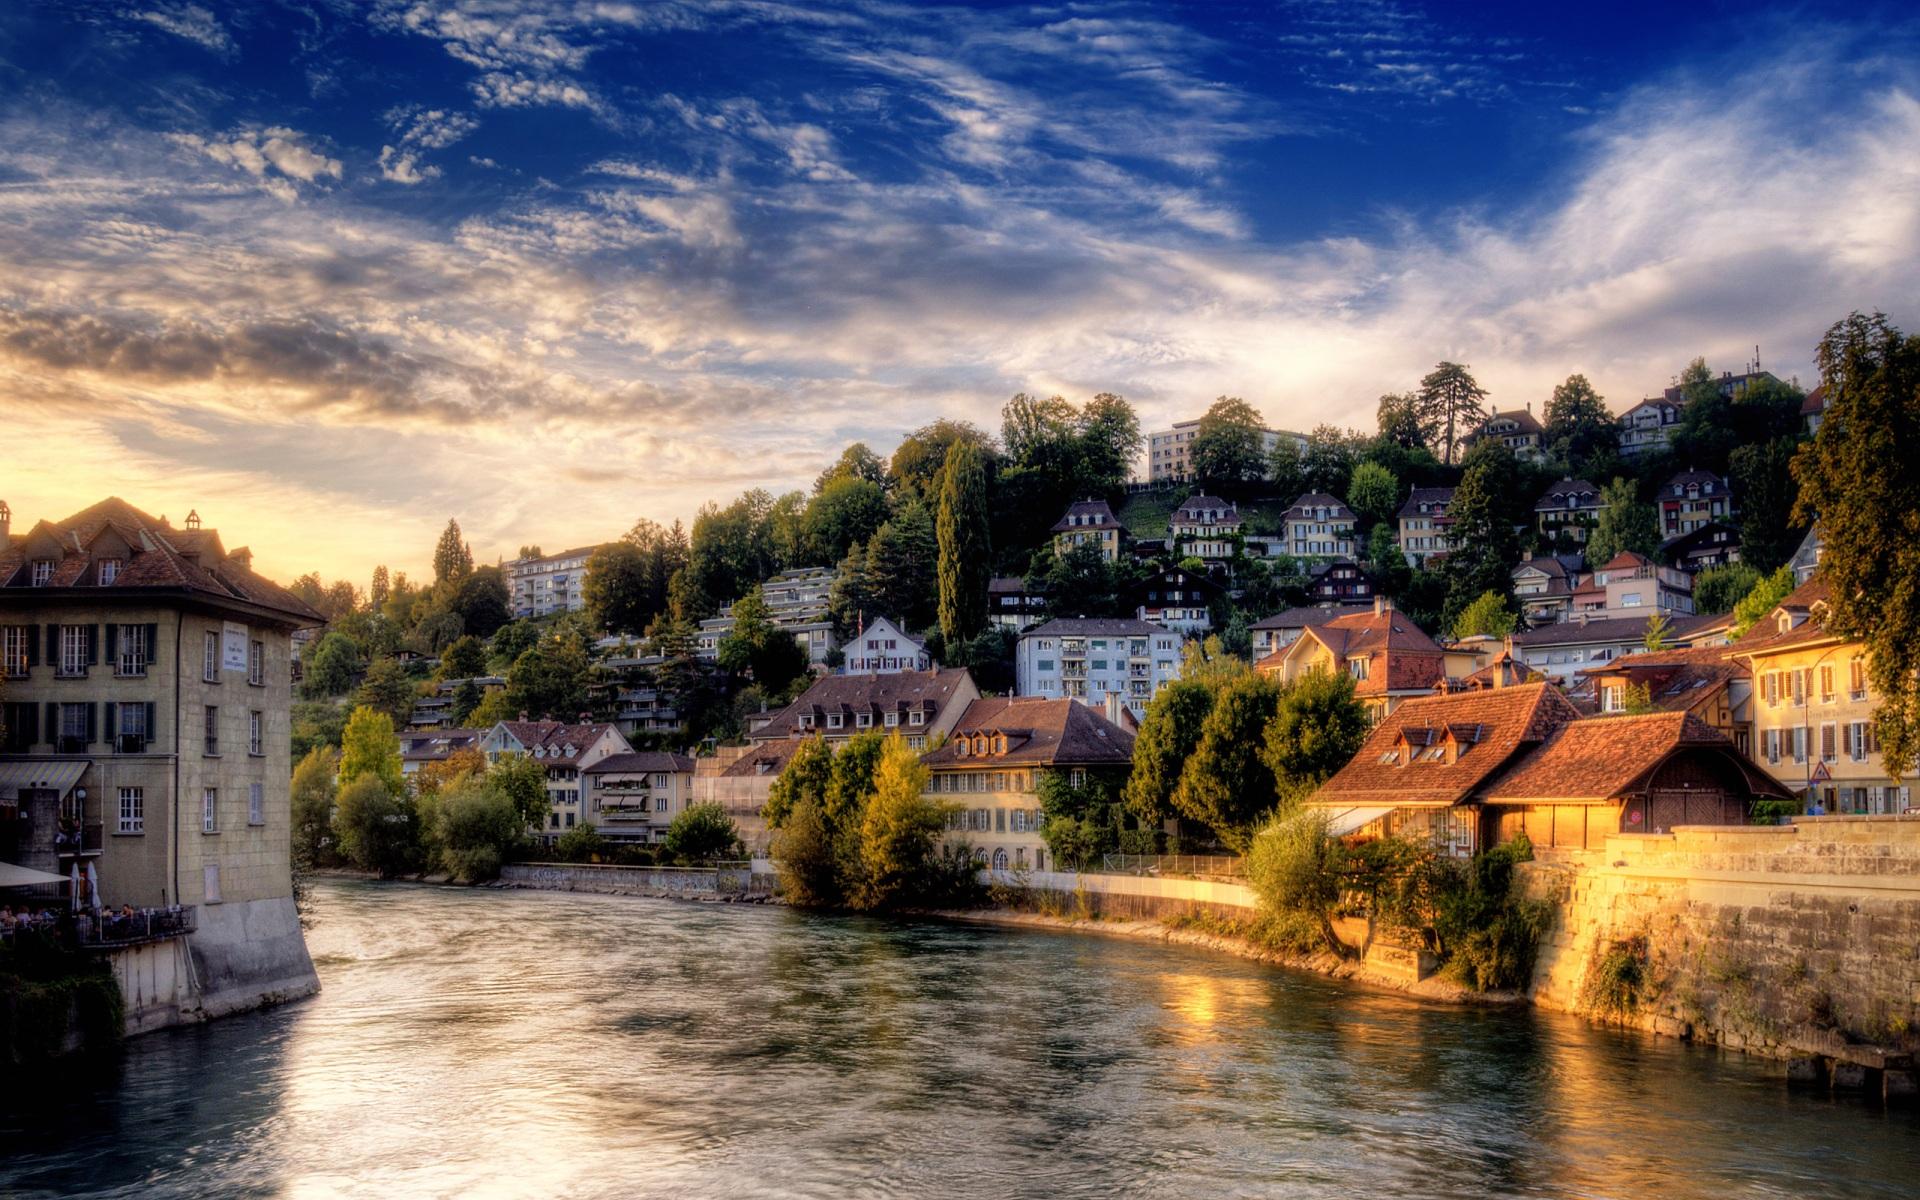 Switzerland-wallpaper-23.jpg